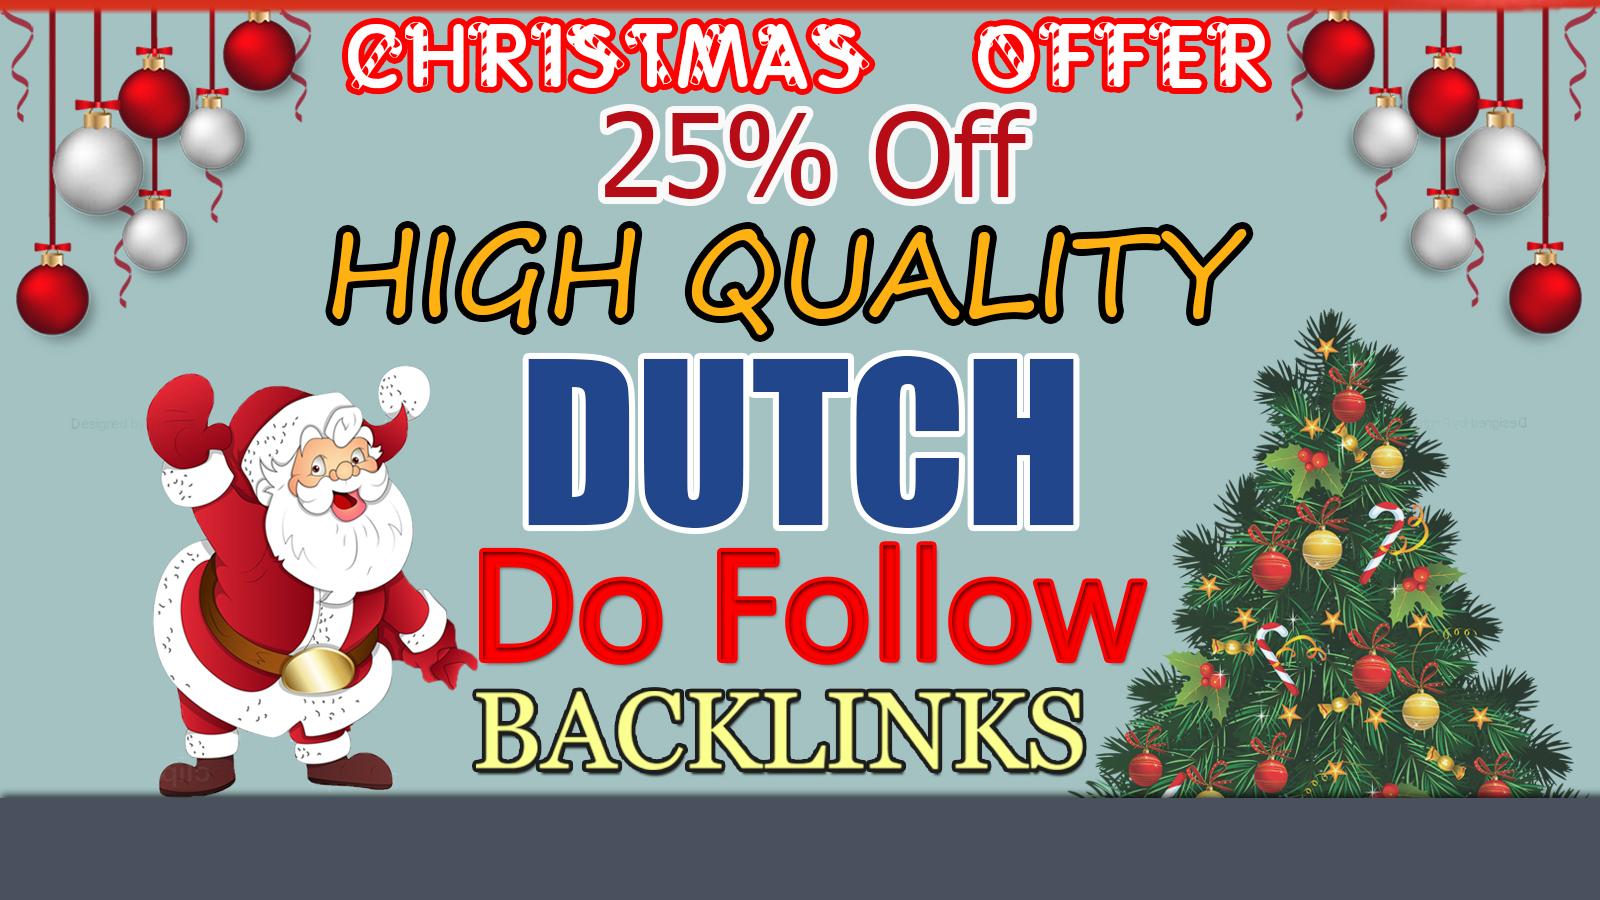 I will do high quality dutch SEO authority 35 backlinks